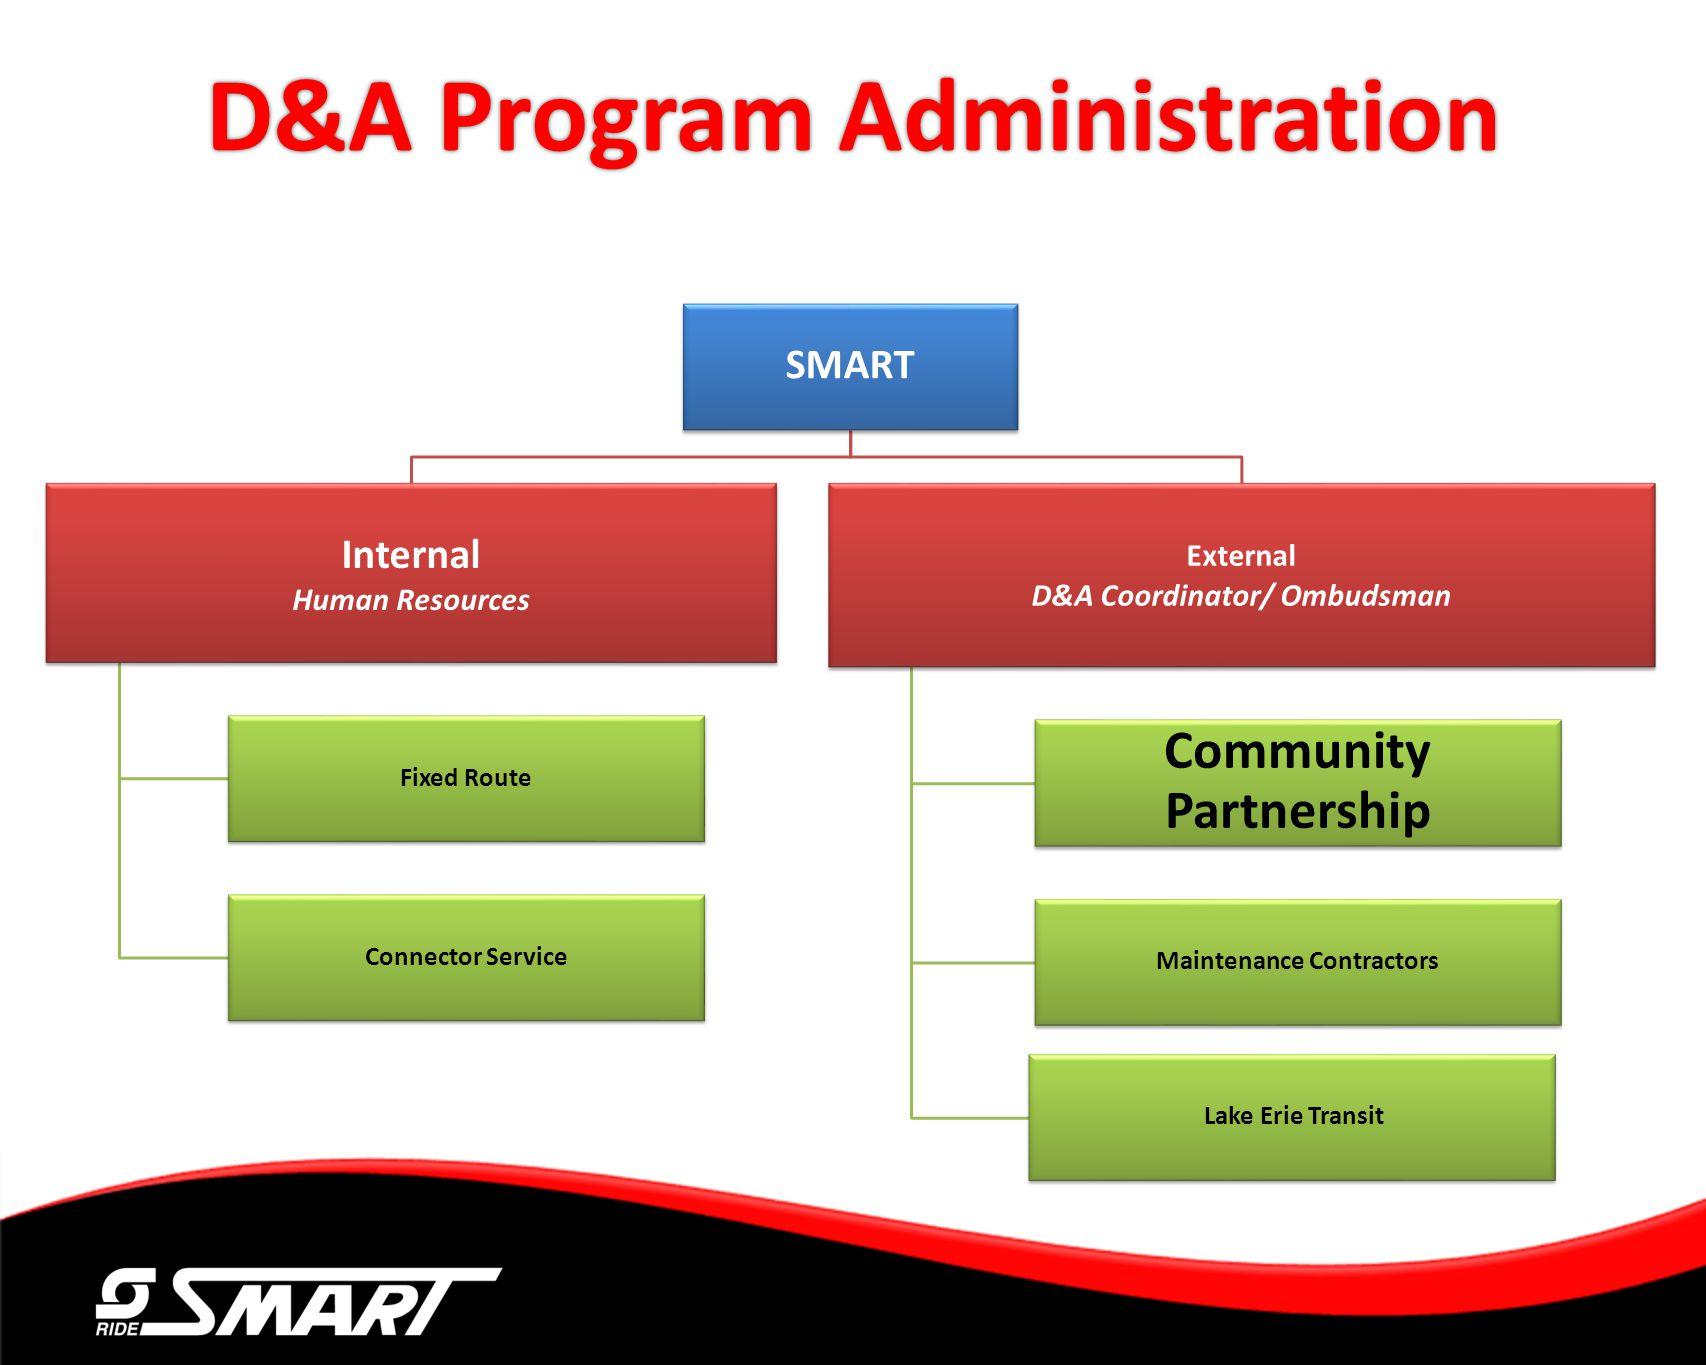 D&A Program Administration SMART Internal Human Resources Fixed Route Connector Service External D&A Coordinator/ Ombudsman Community Partnership Main